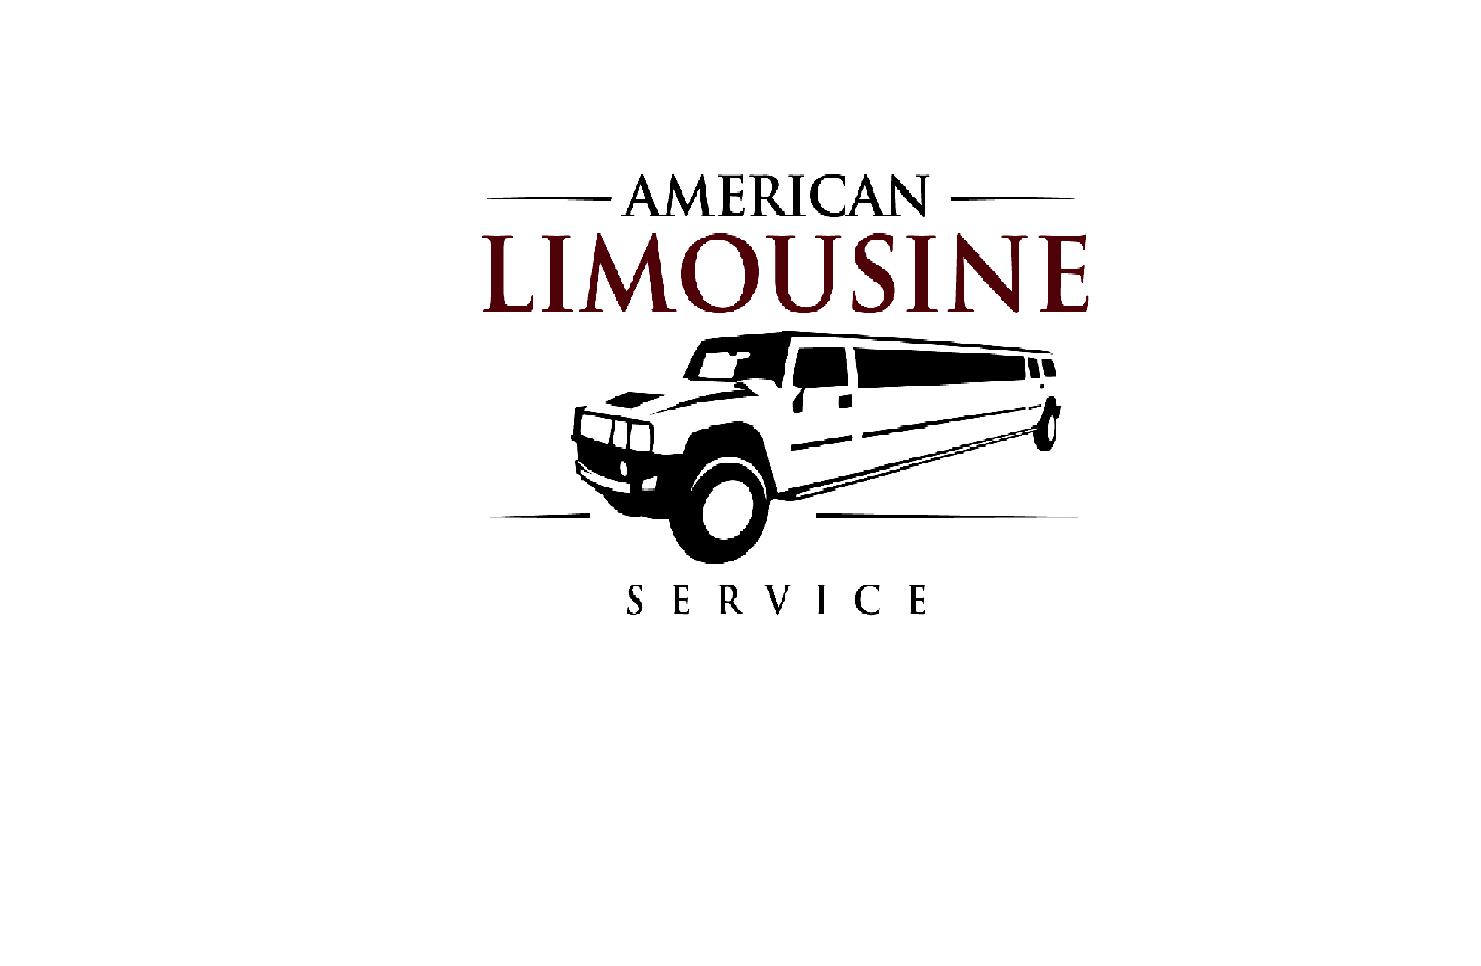 limousinenservice m nchen bavaria american limousine. Black Bedroom Furniture Sets. Home Design Ideas